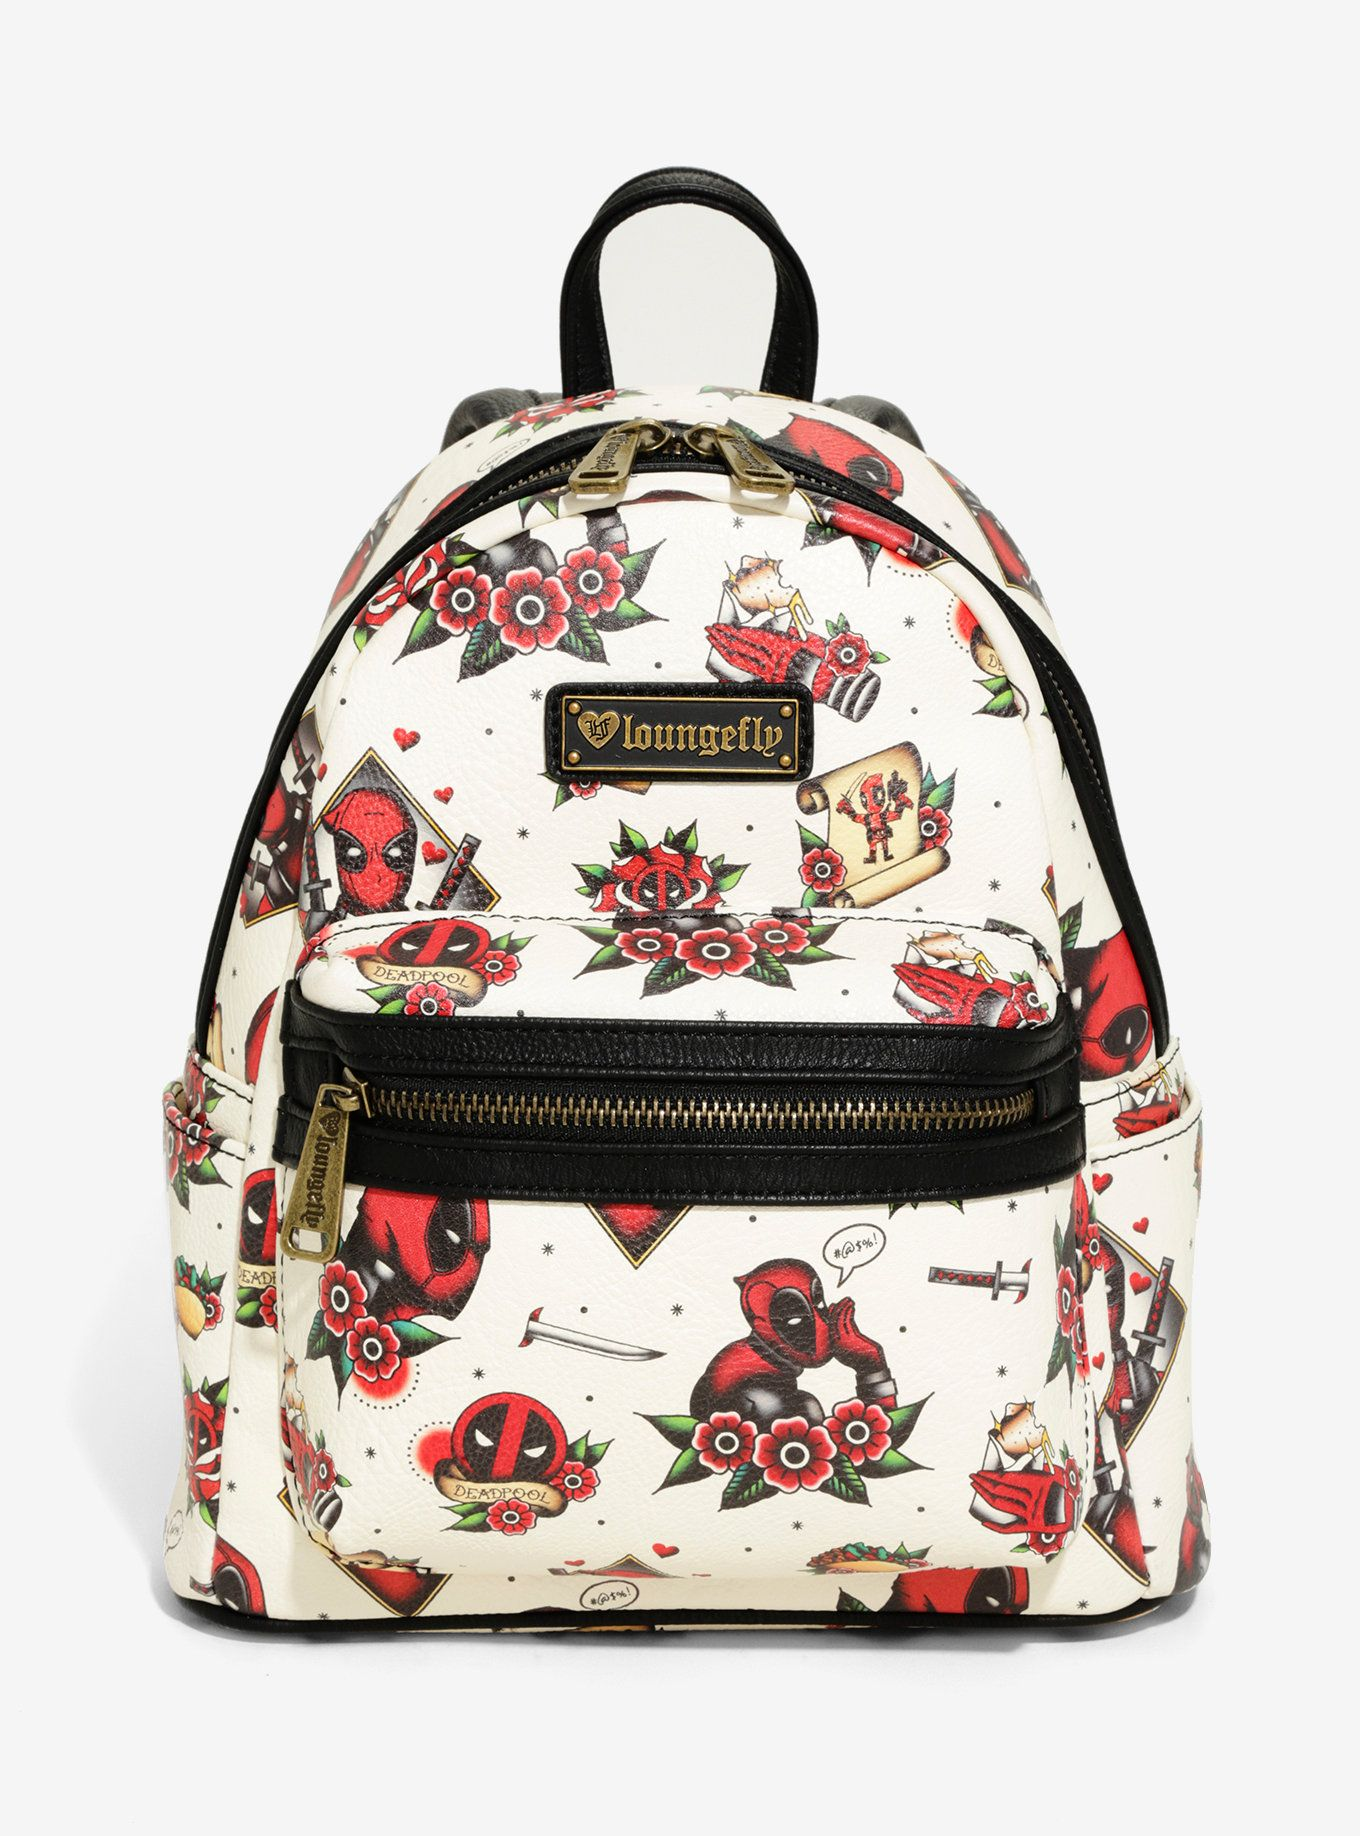 70bfca8b4c Loungefly X Marvel Guardians Of The Galaxy Kawaii Mini Backpack ...